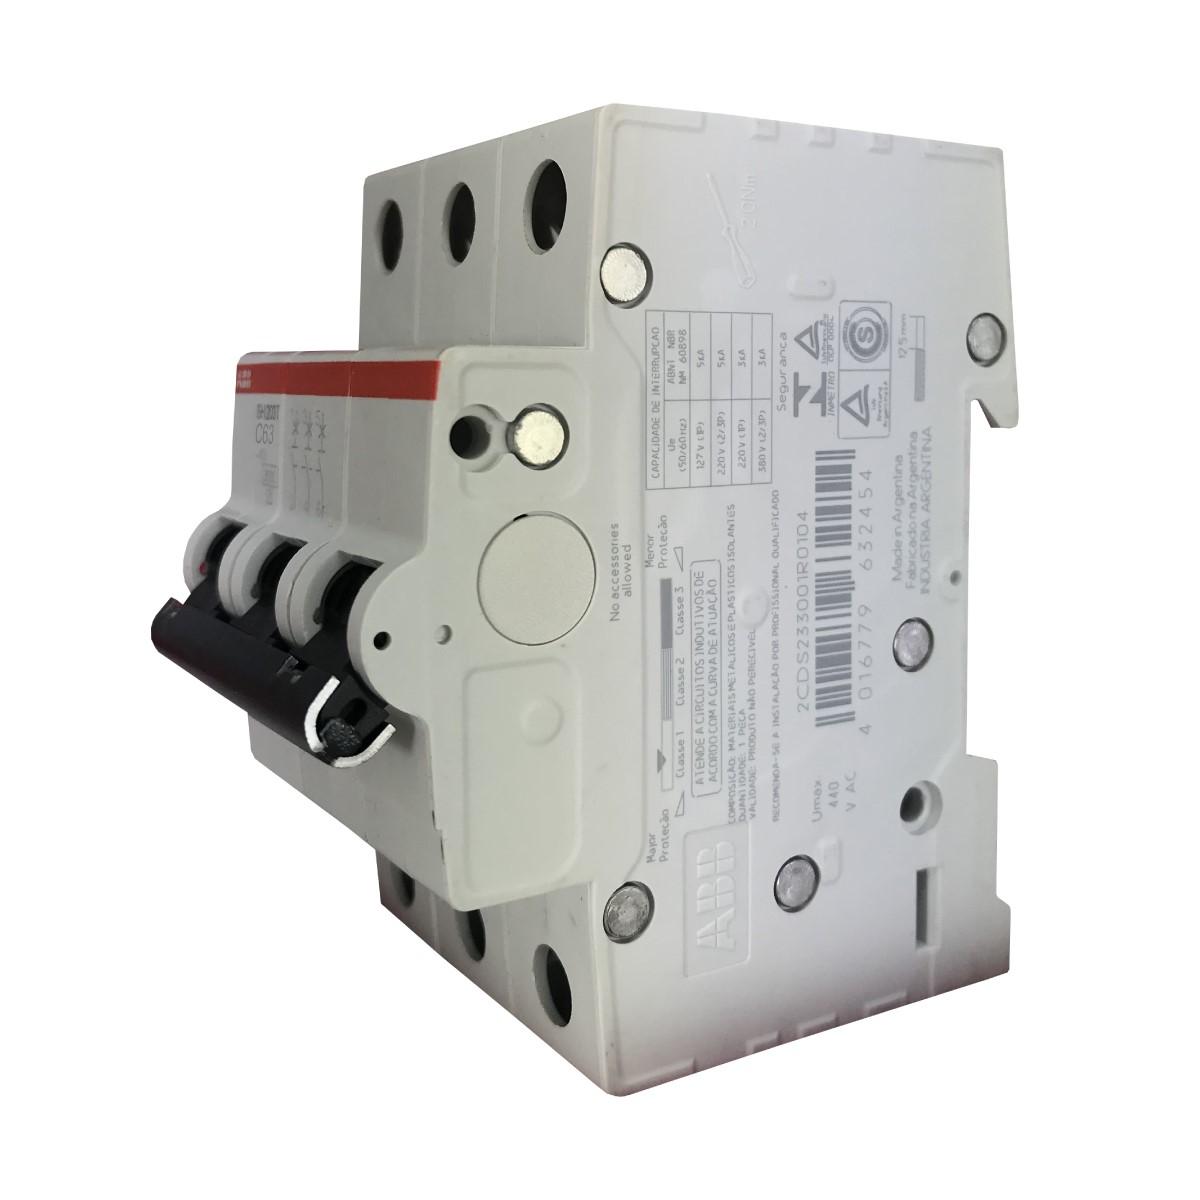 SH203 T-C63_ABB_PeR Automação Industrial